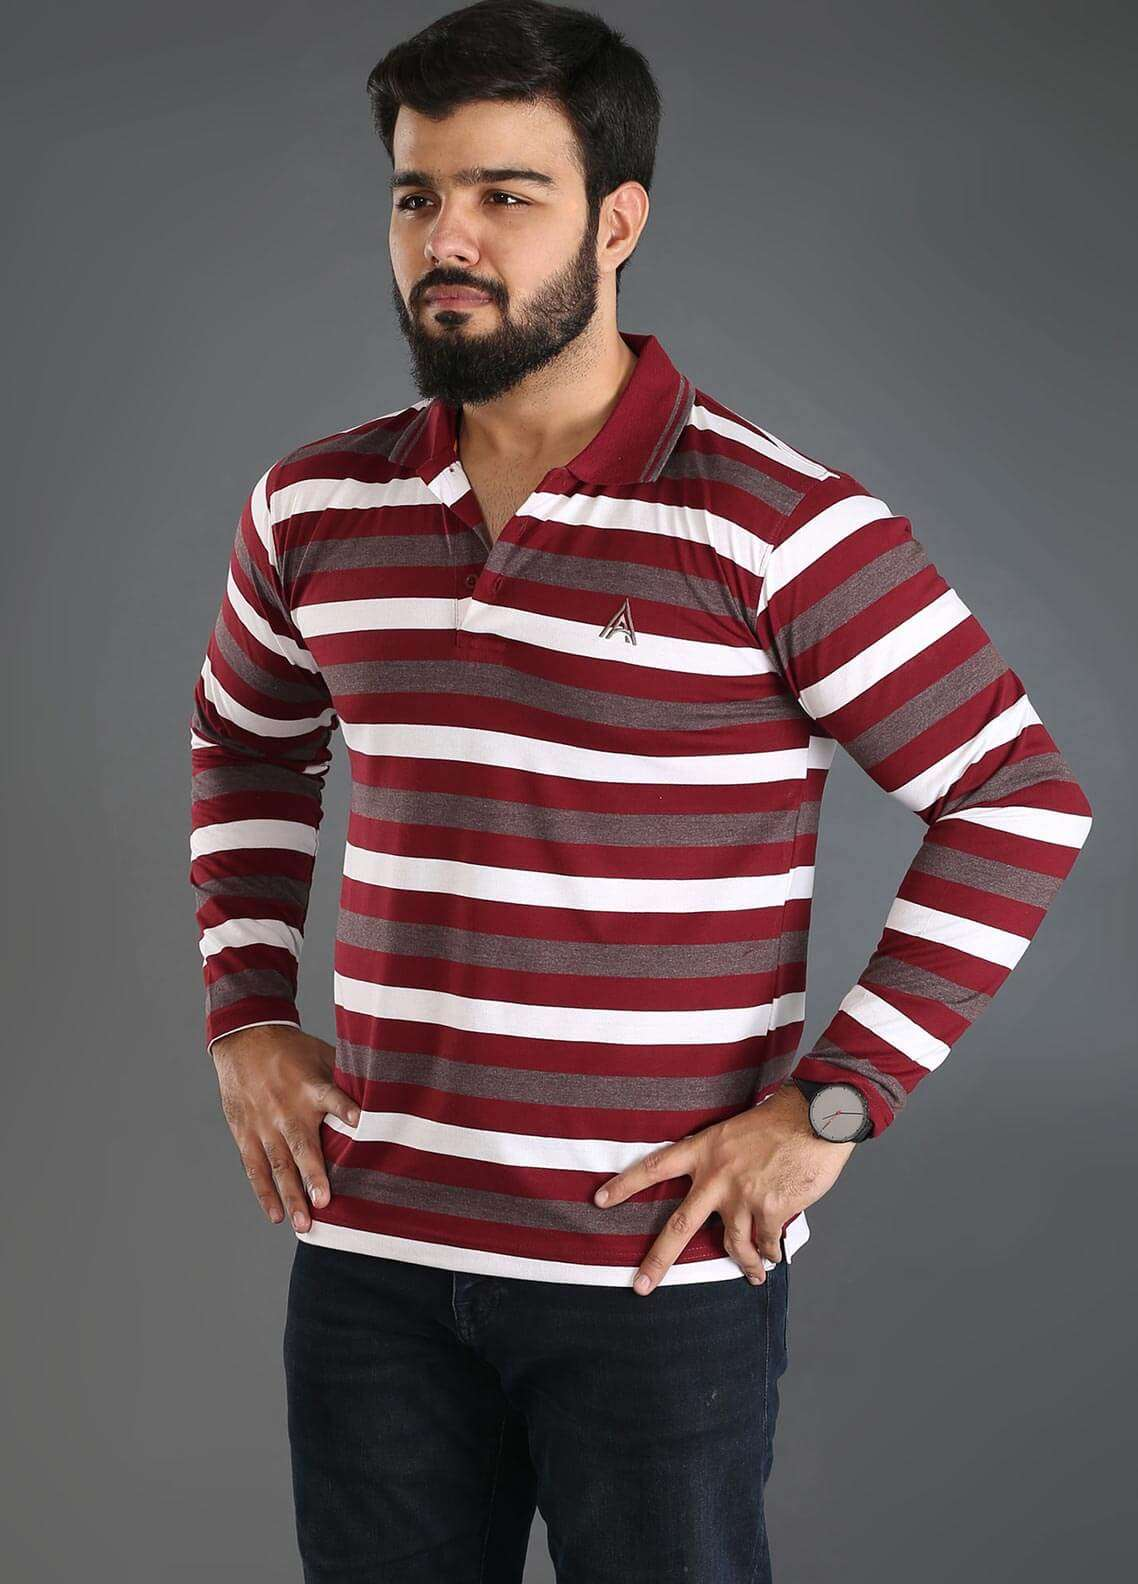 Anchor Jersey Polo Men T-Shirts - Multi A-257